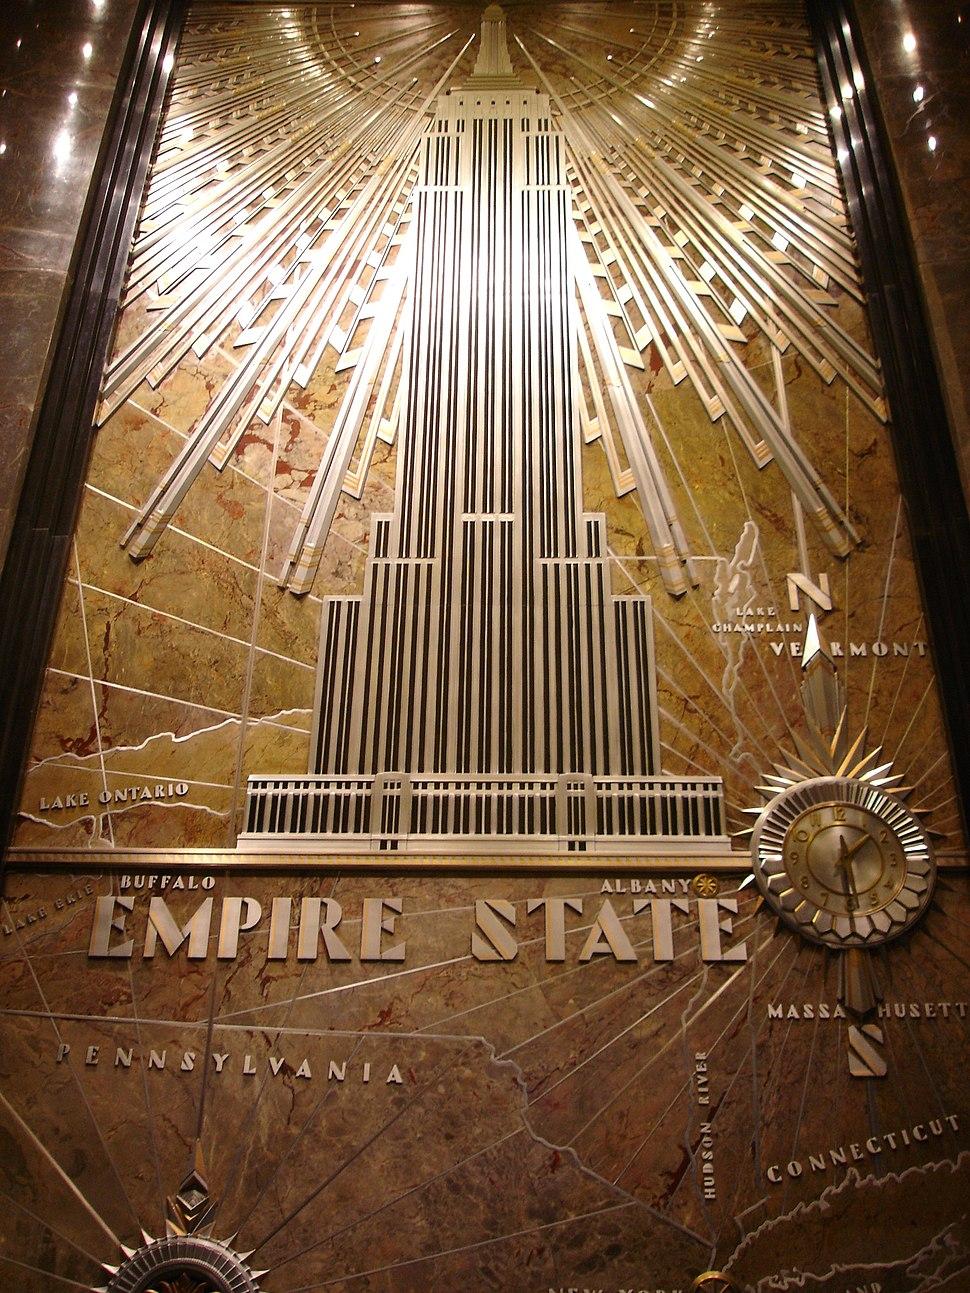 Empire State Building in Manhattan, New York, USA (9892744176)